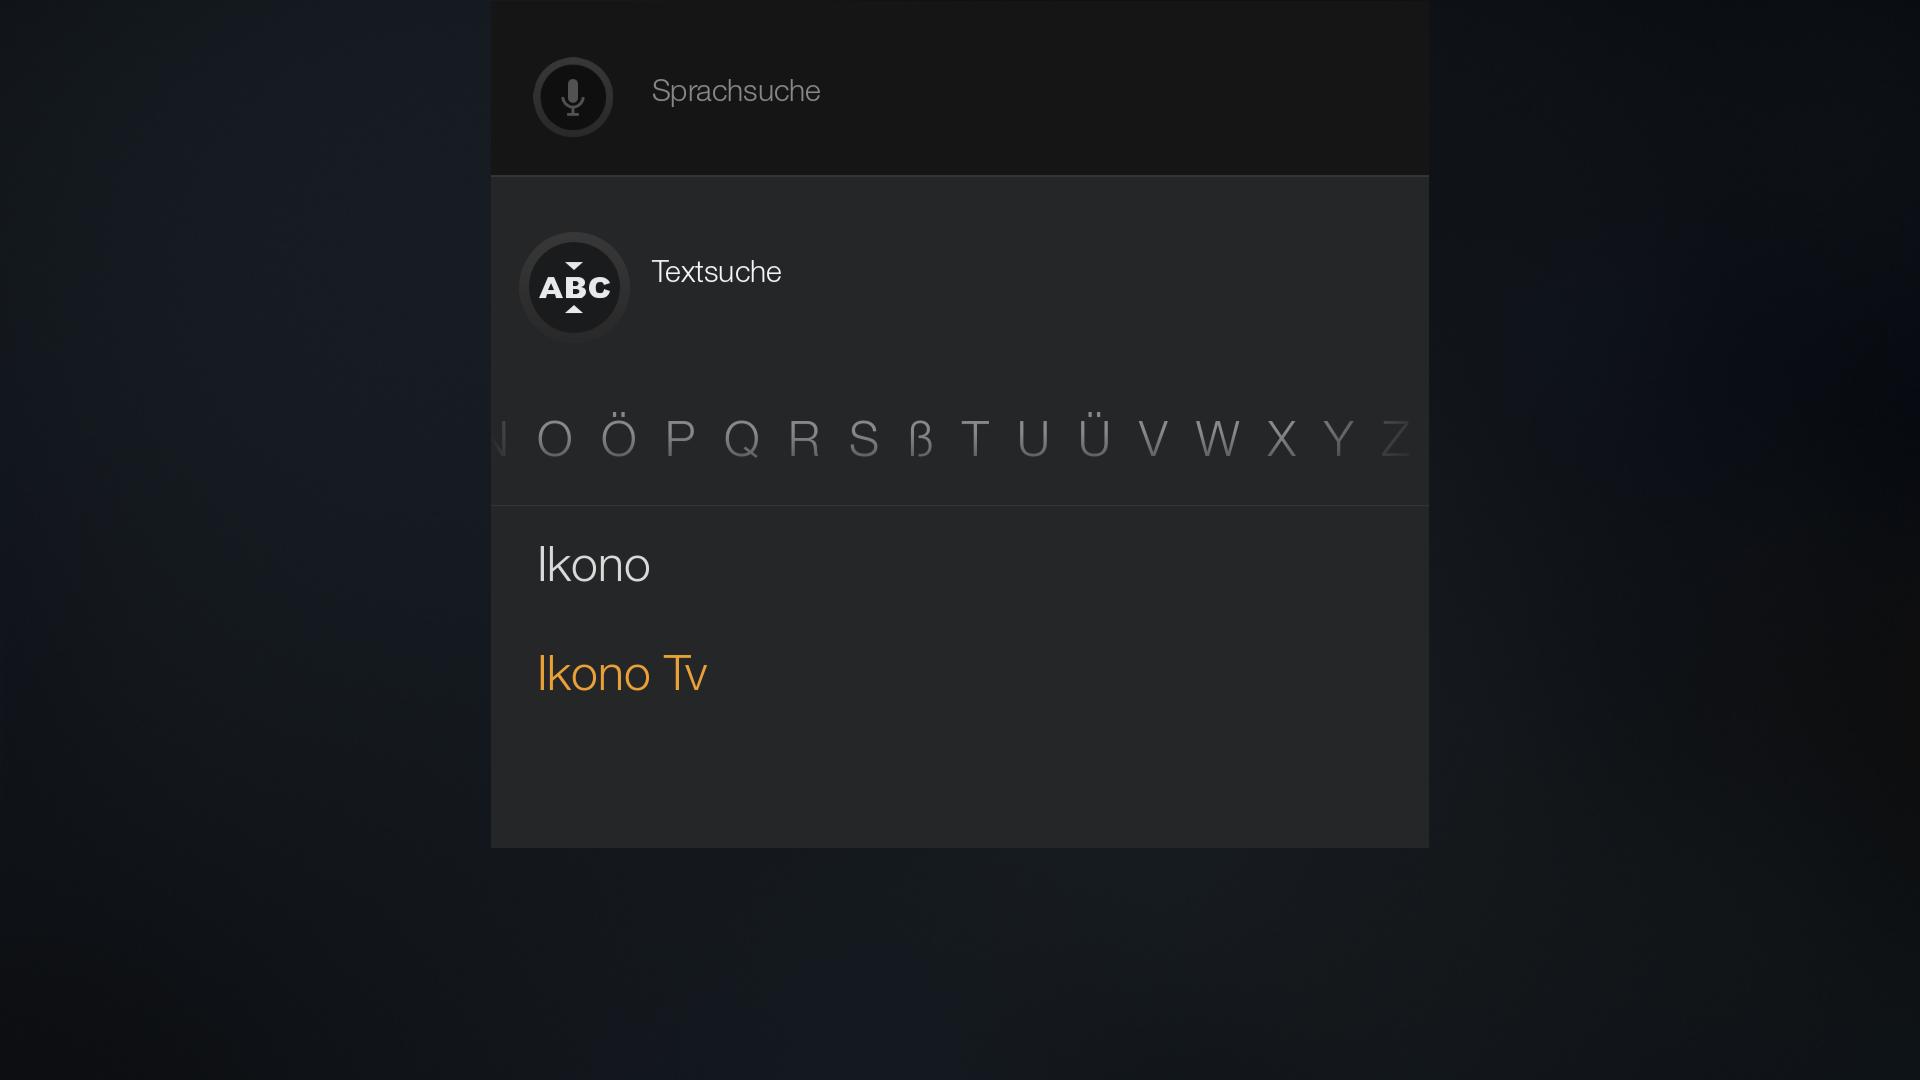 Workshop: Amazons Fire TV wird zur Multimedia-Zentrale - Ikono TV per Bildschirmtastatur suchen (Screenshot: Golem.de)